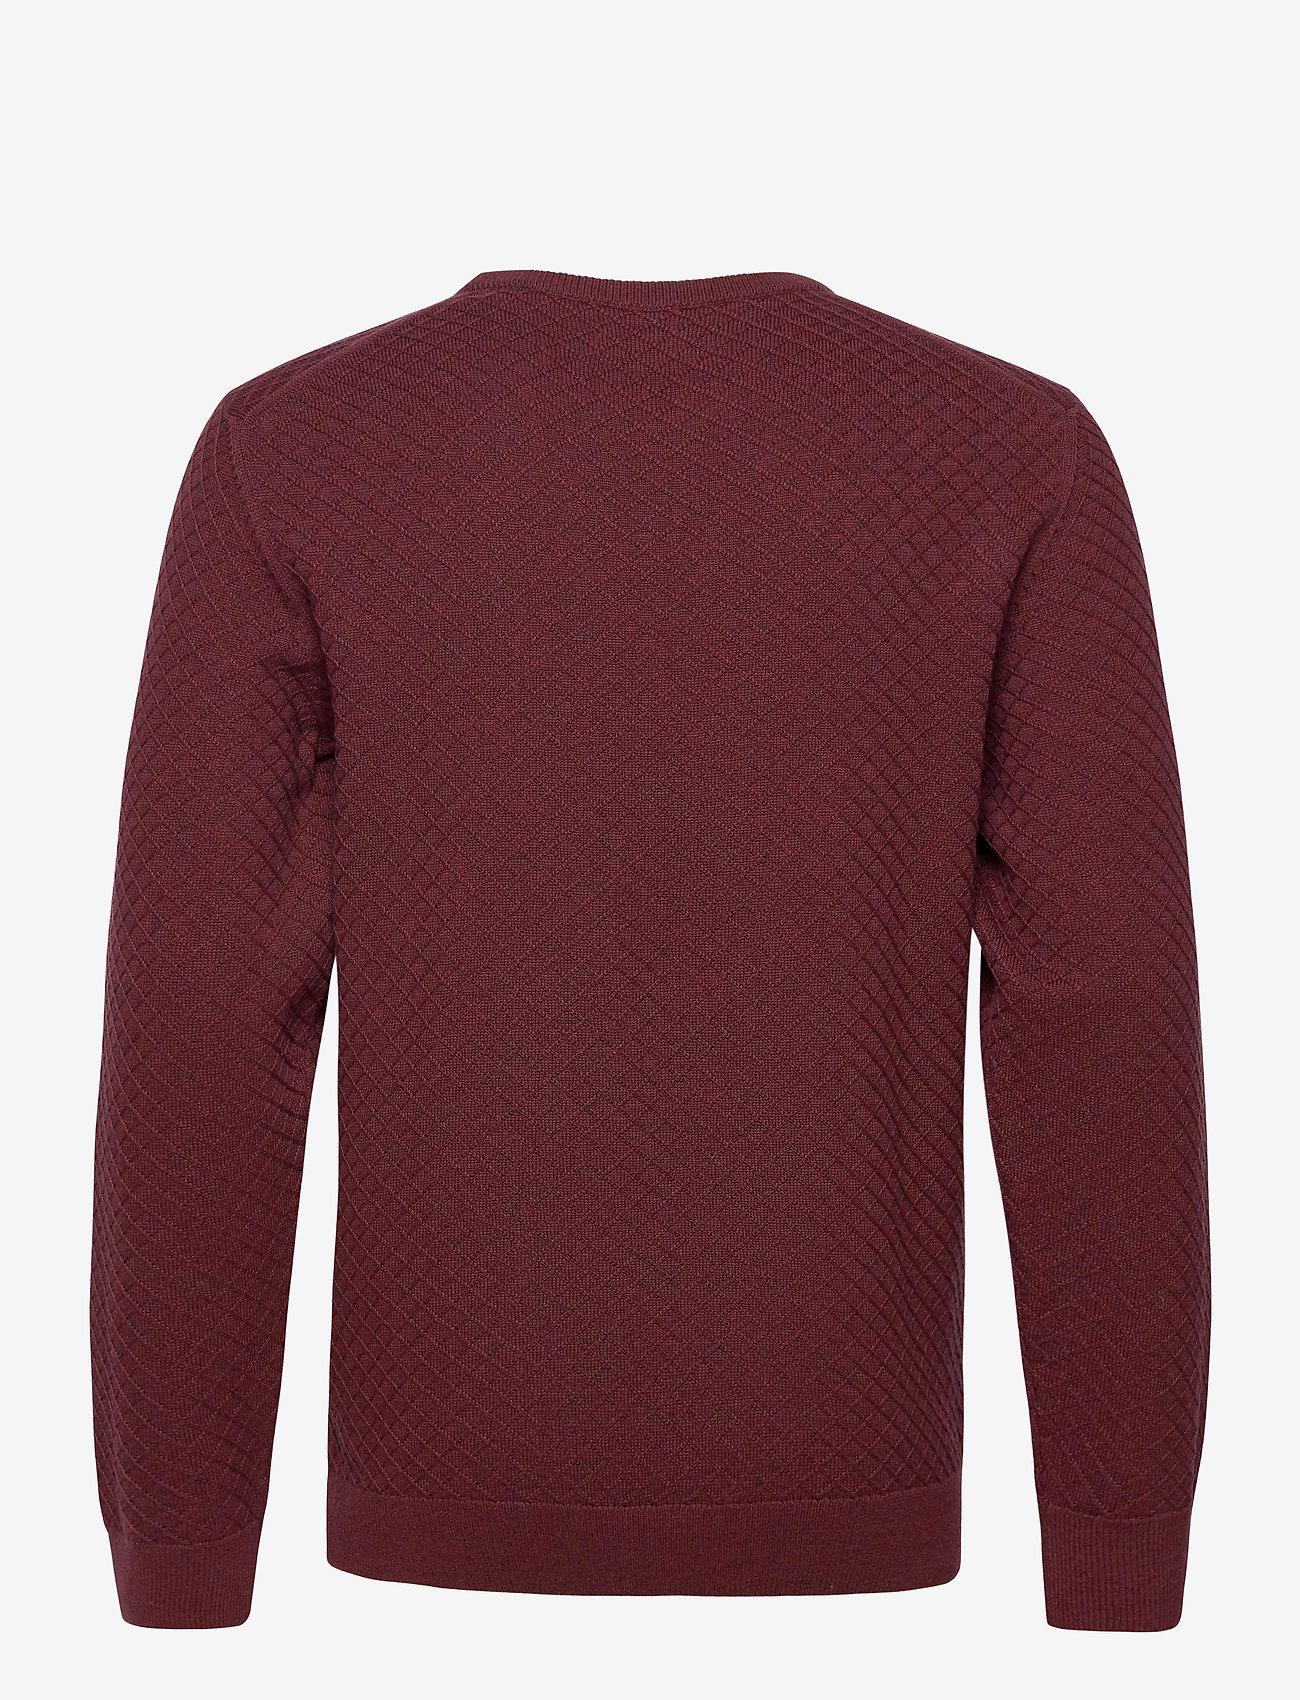 GANT - D1. COTTON TEXTURE CREW - basic knitwear - dk. burgundy mel - 1